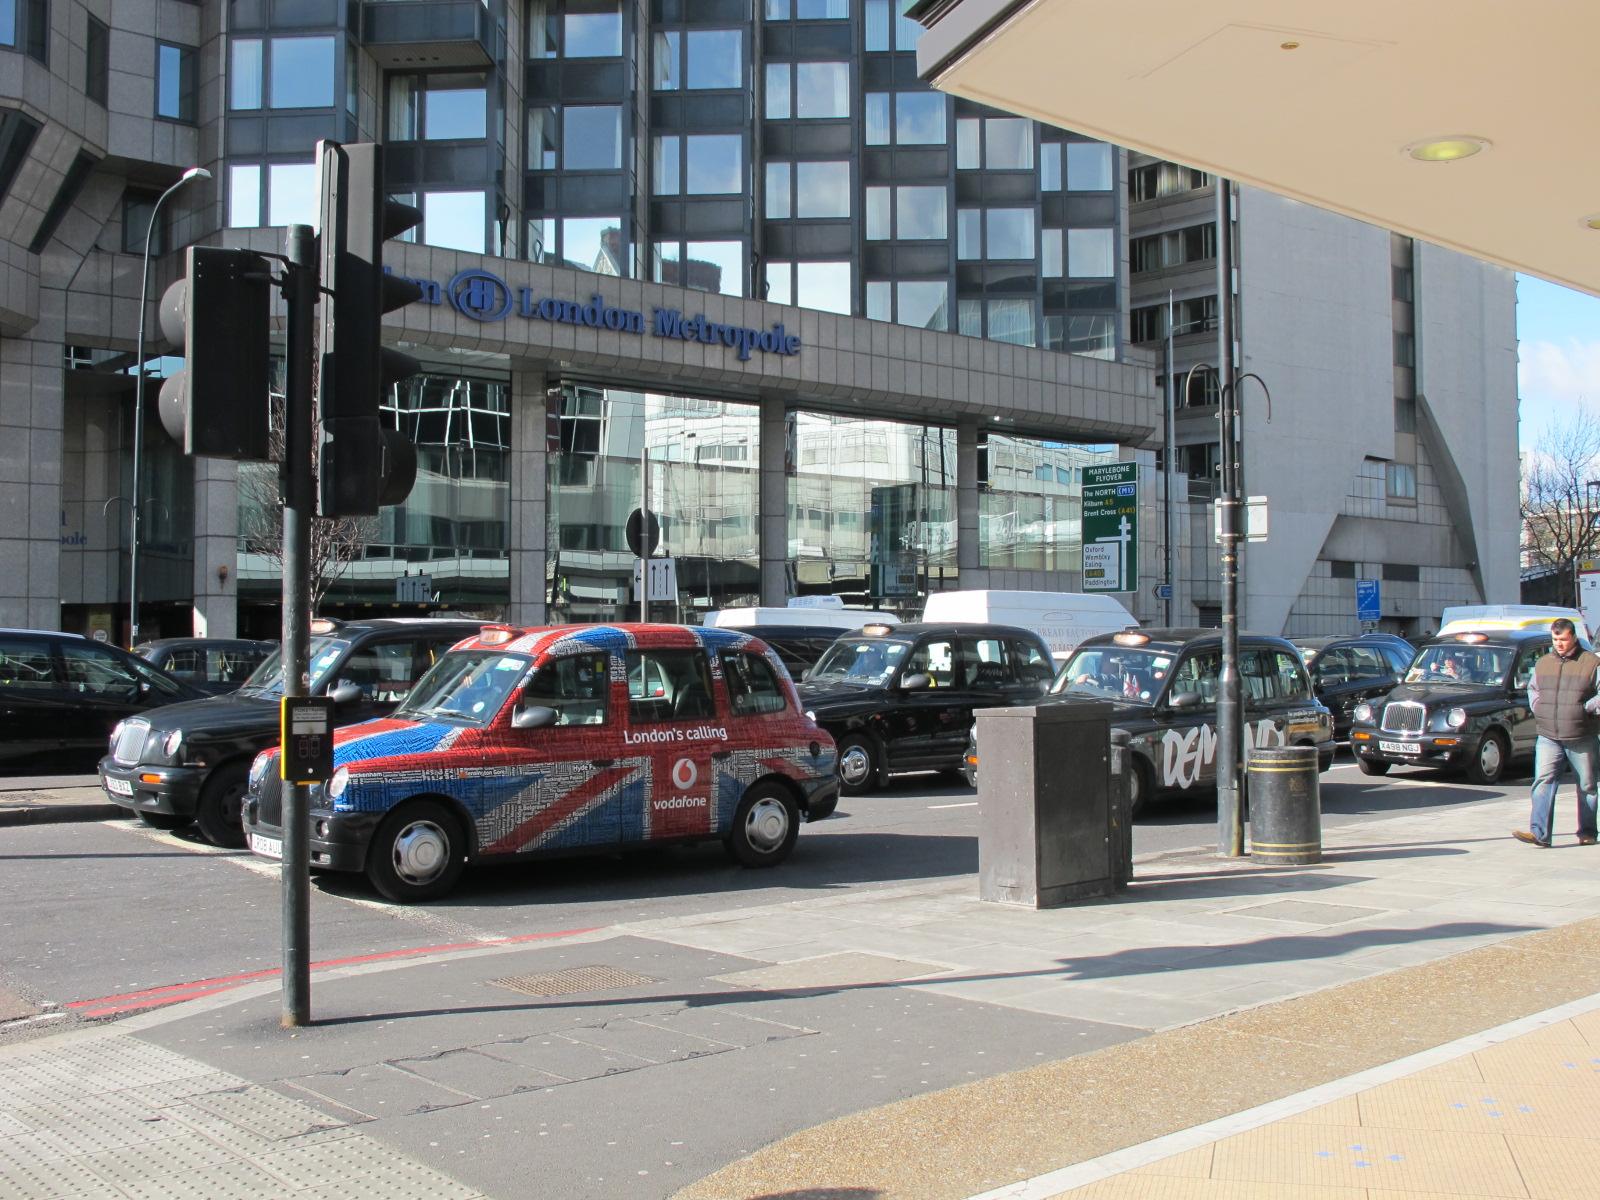 London-2012-Taxi